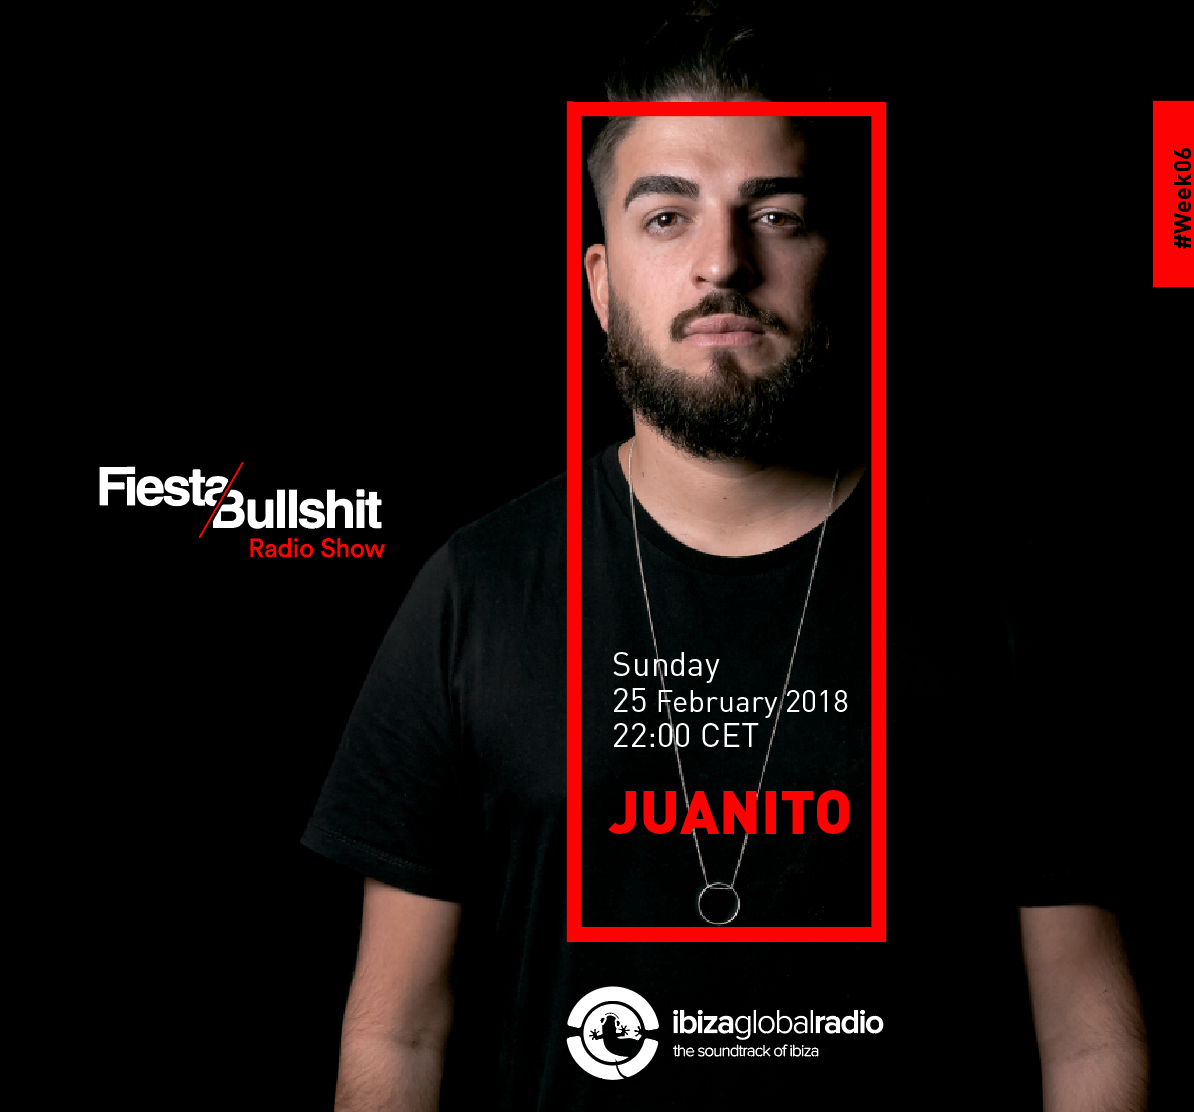 ibiza global radio Juanito